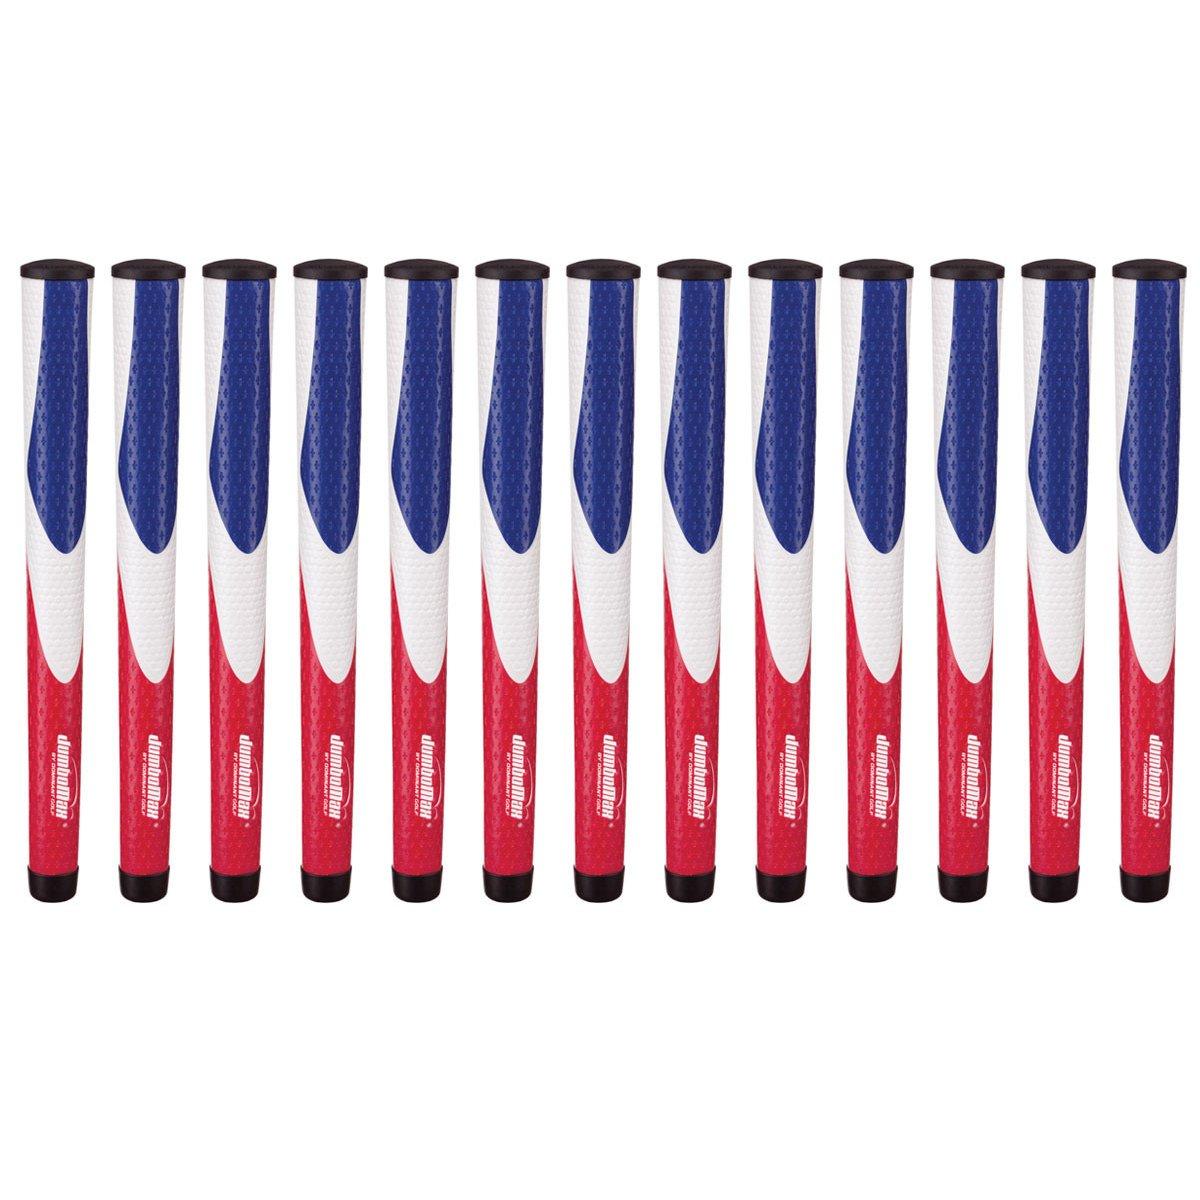 JumboMaxツアーシリーズゴルフグリップバンドル(13個) X-Large レッド/ホワイト/ブルー B01C8W91AC